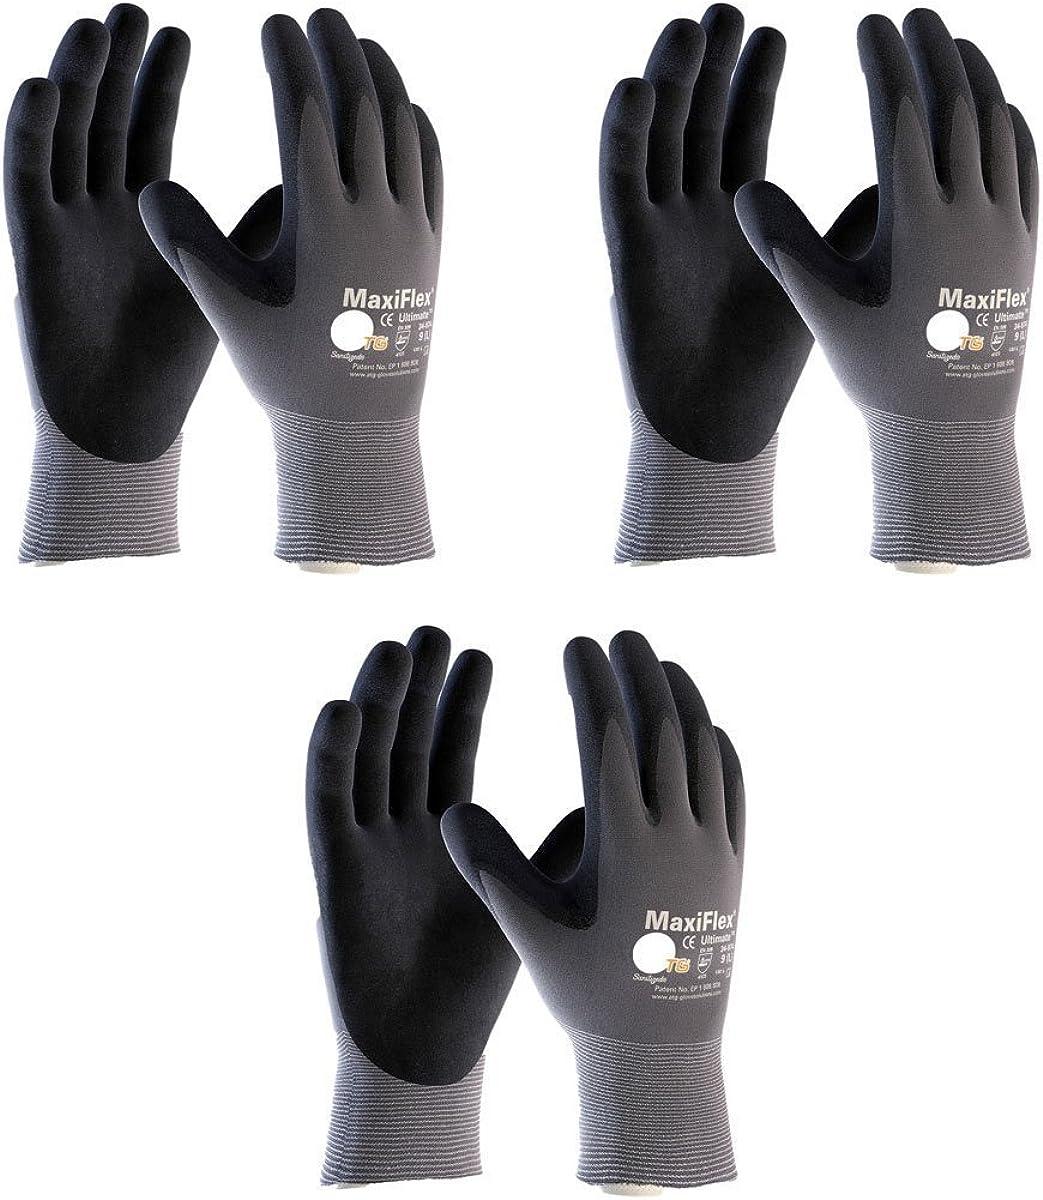 3 Max 79% OFF Pack MaxiFlex 34-874 XS Gloves Max 57% OFF Palm Nitrile Micro-Foam Grip